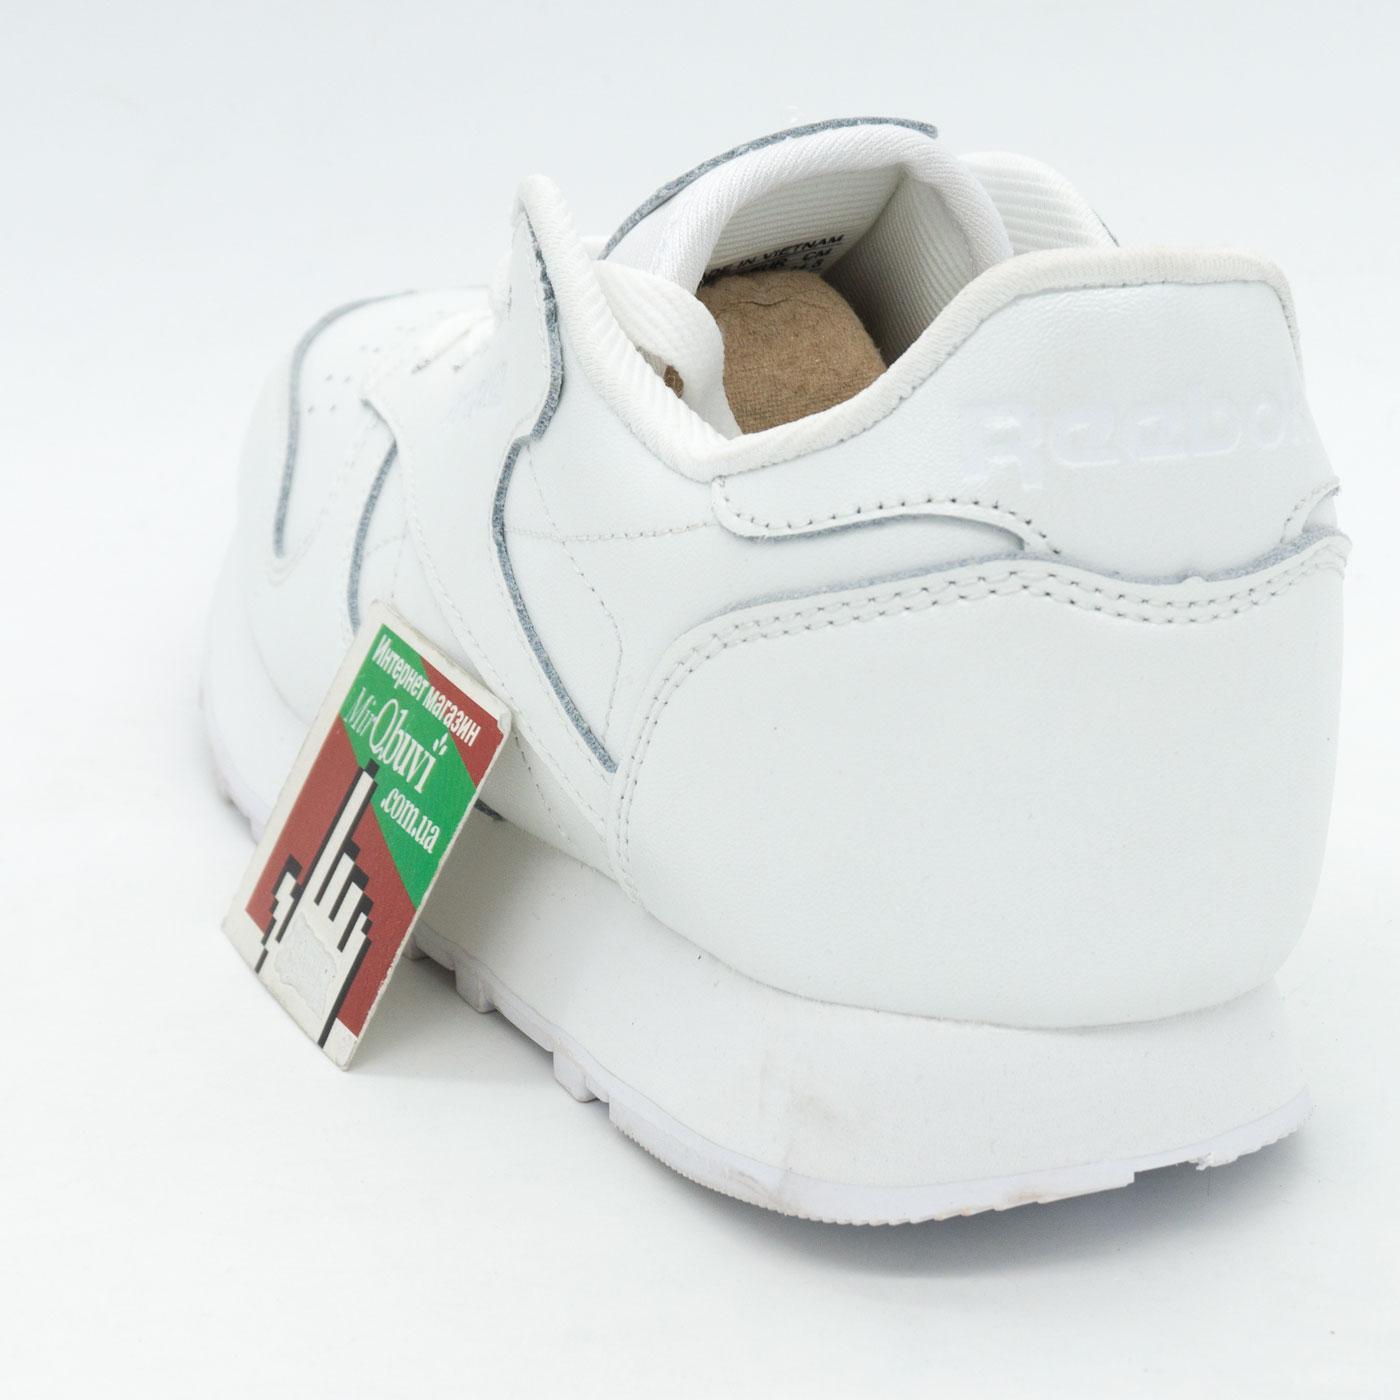 фото back Женские кроссовки Reebok classic leather white (Рибок класик белые, кожа) back